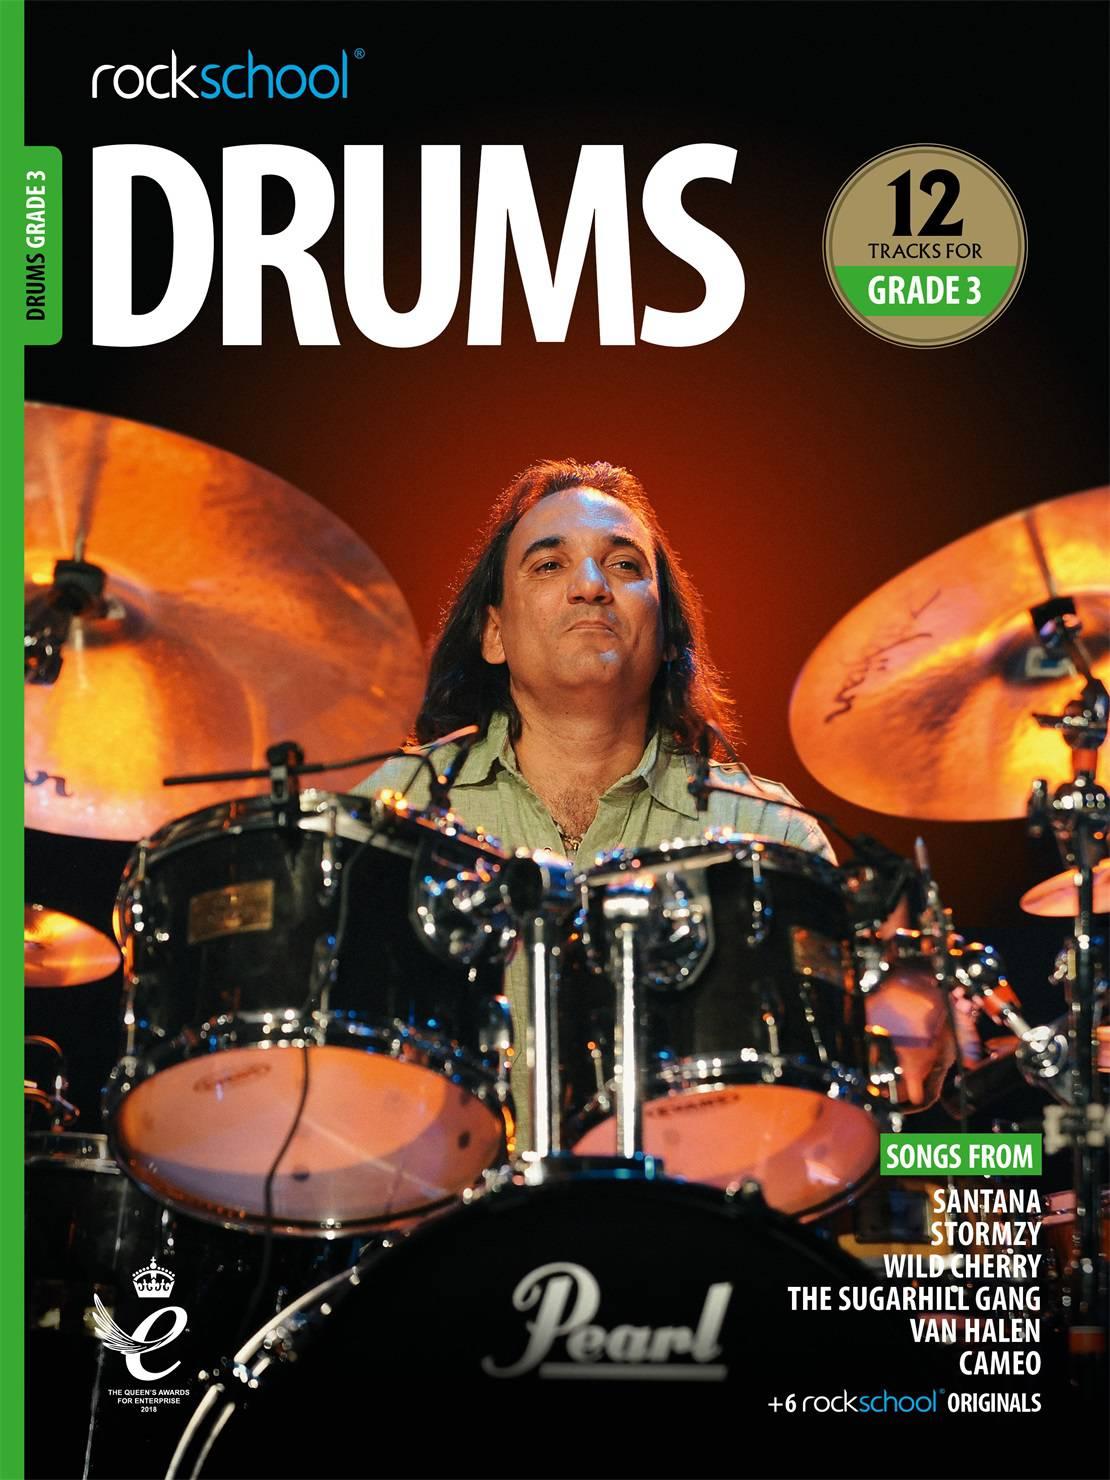 Rockschool - Shop - Drums Grade 3   RSL